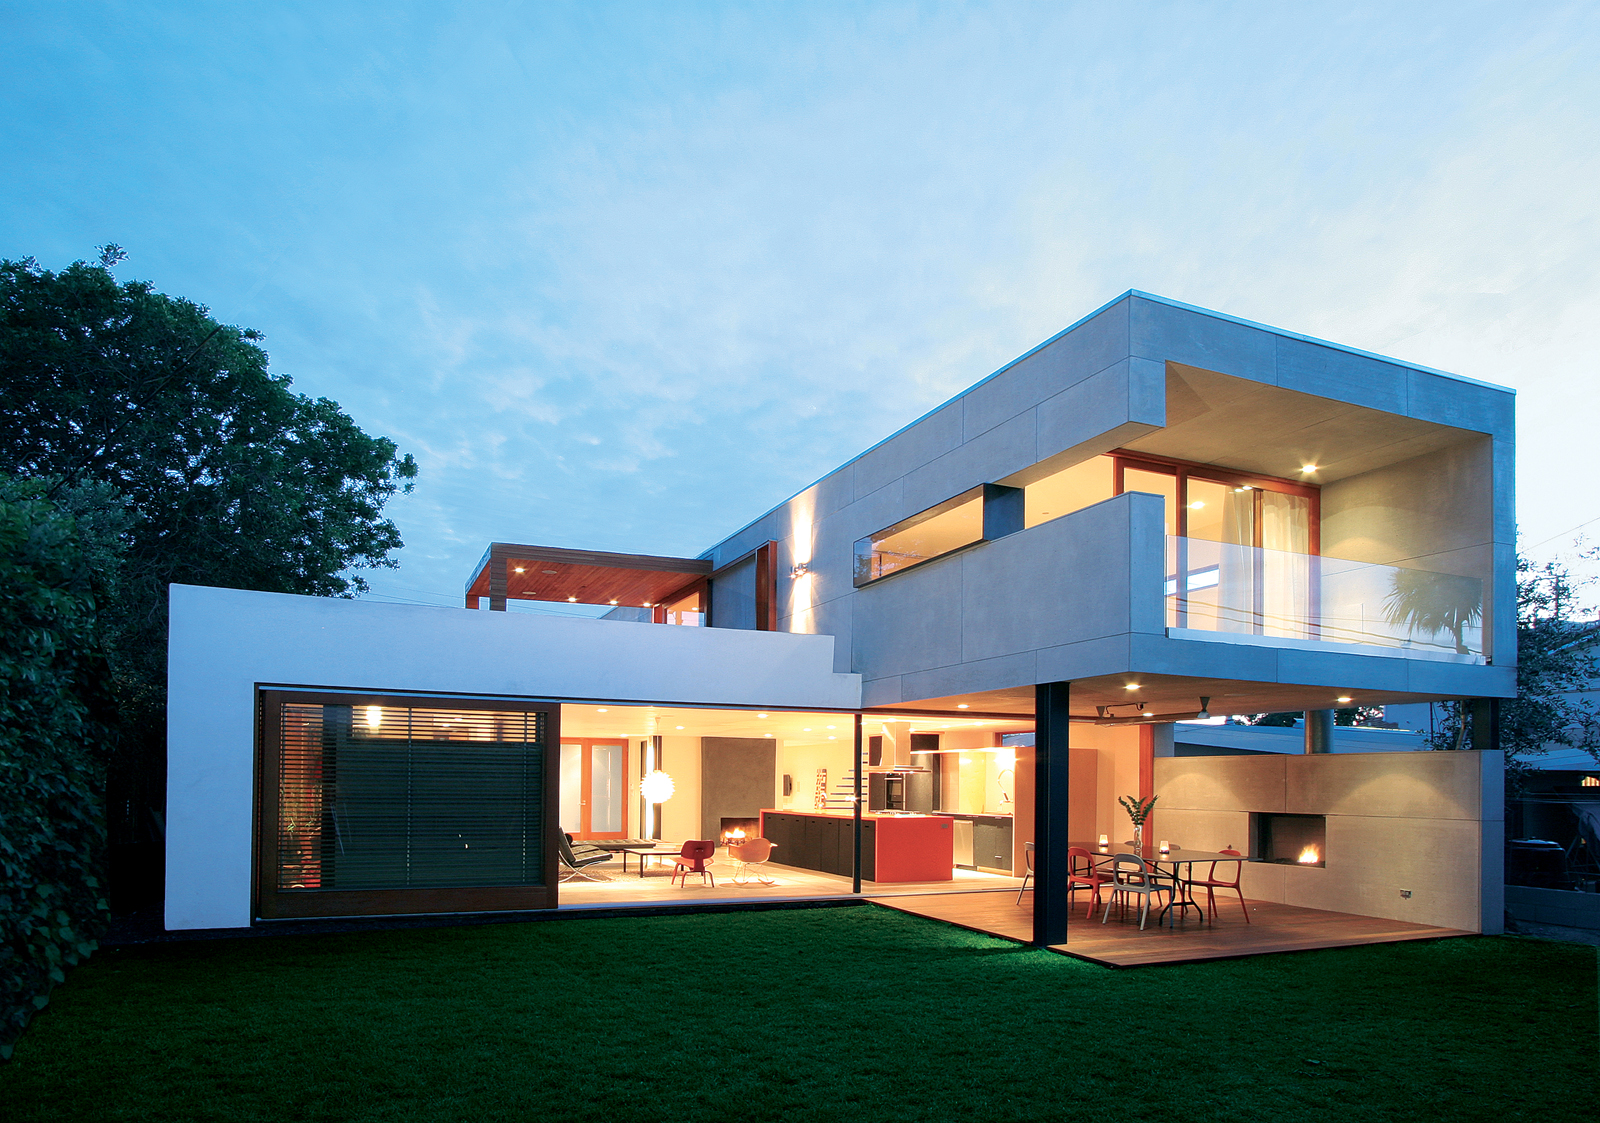 minarc house exterior